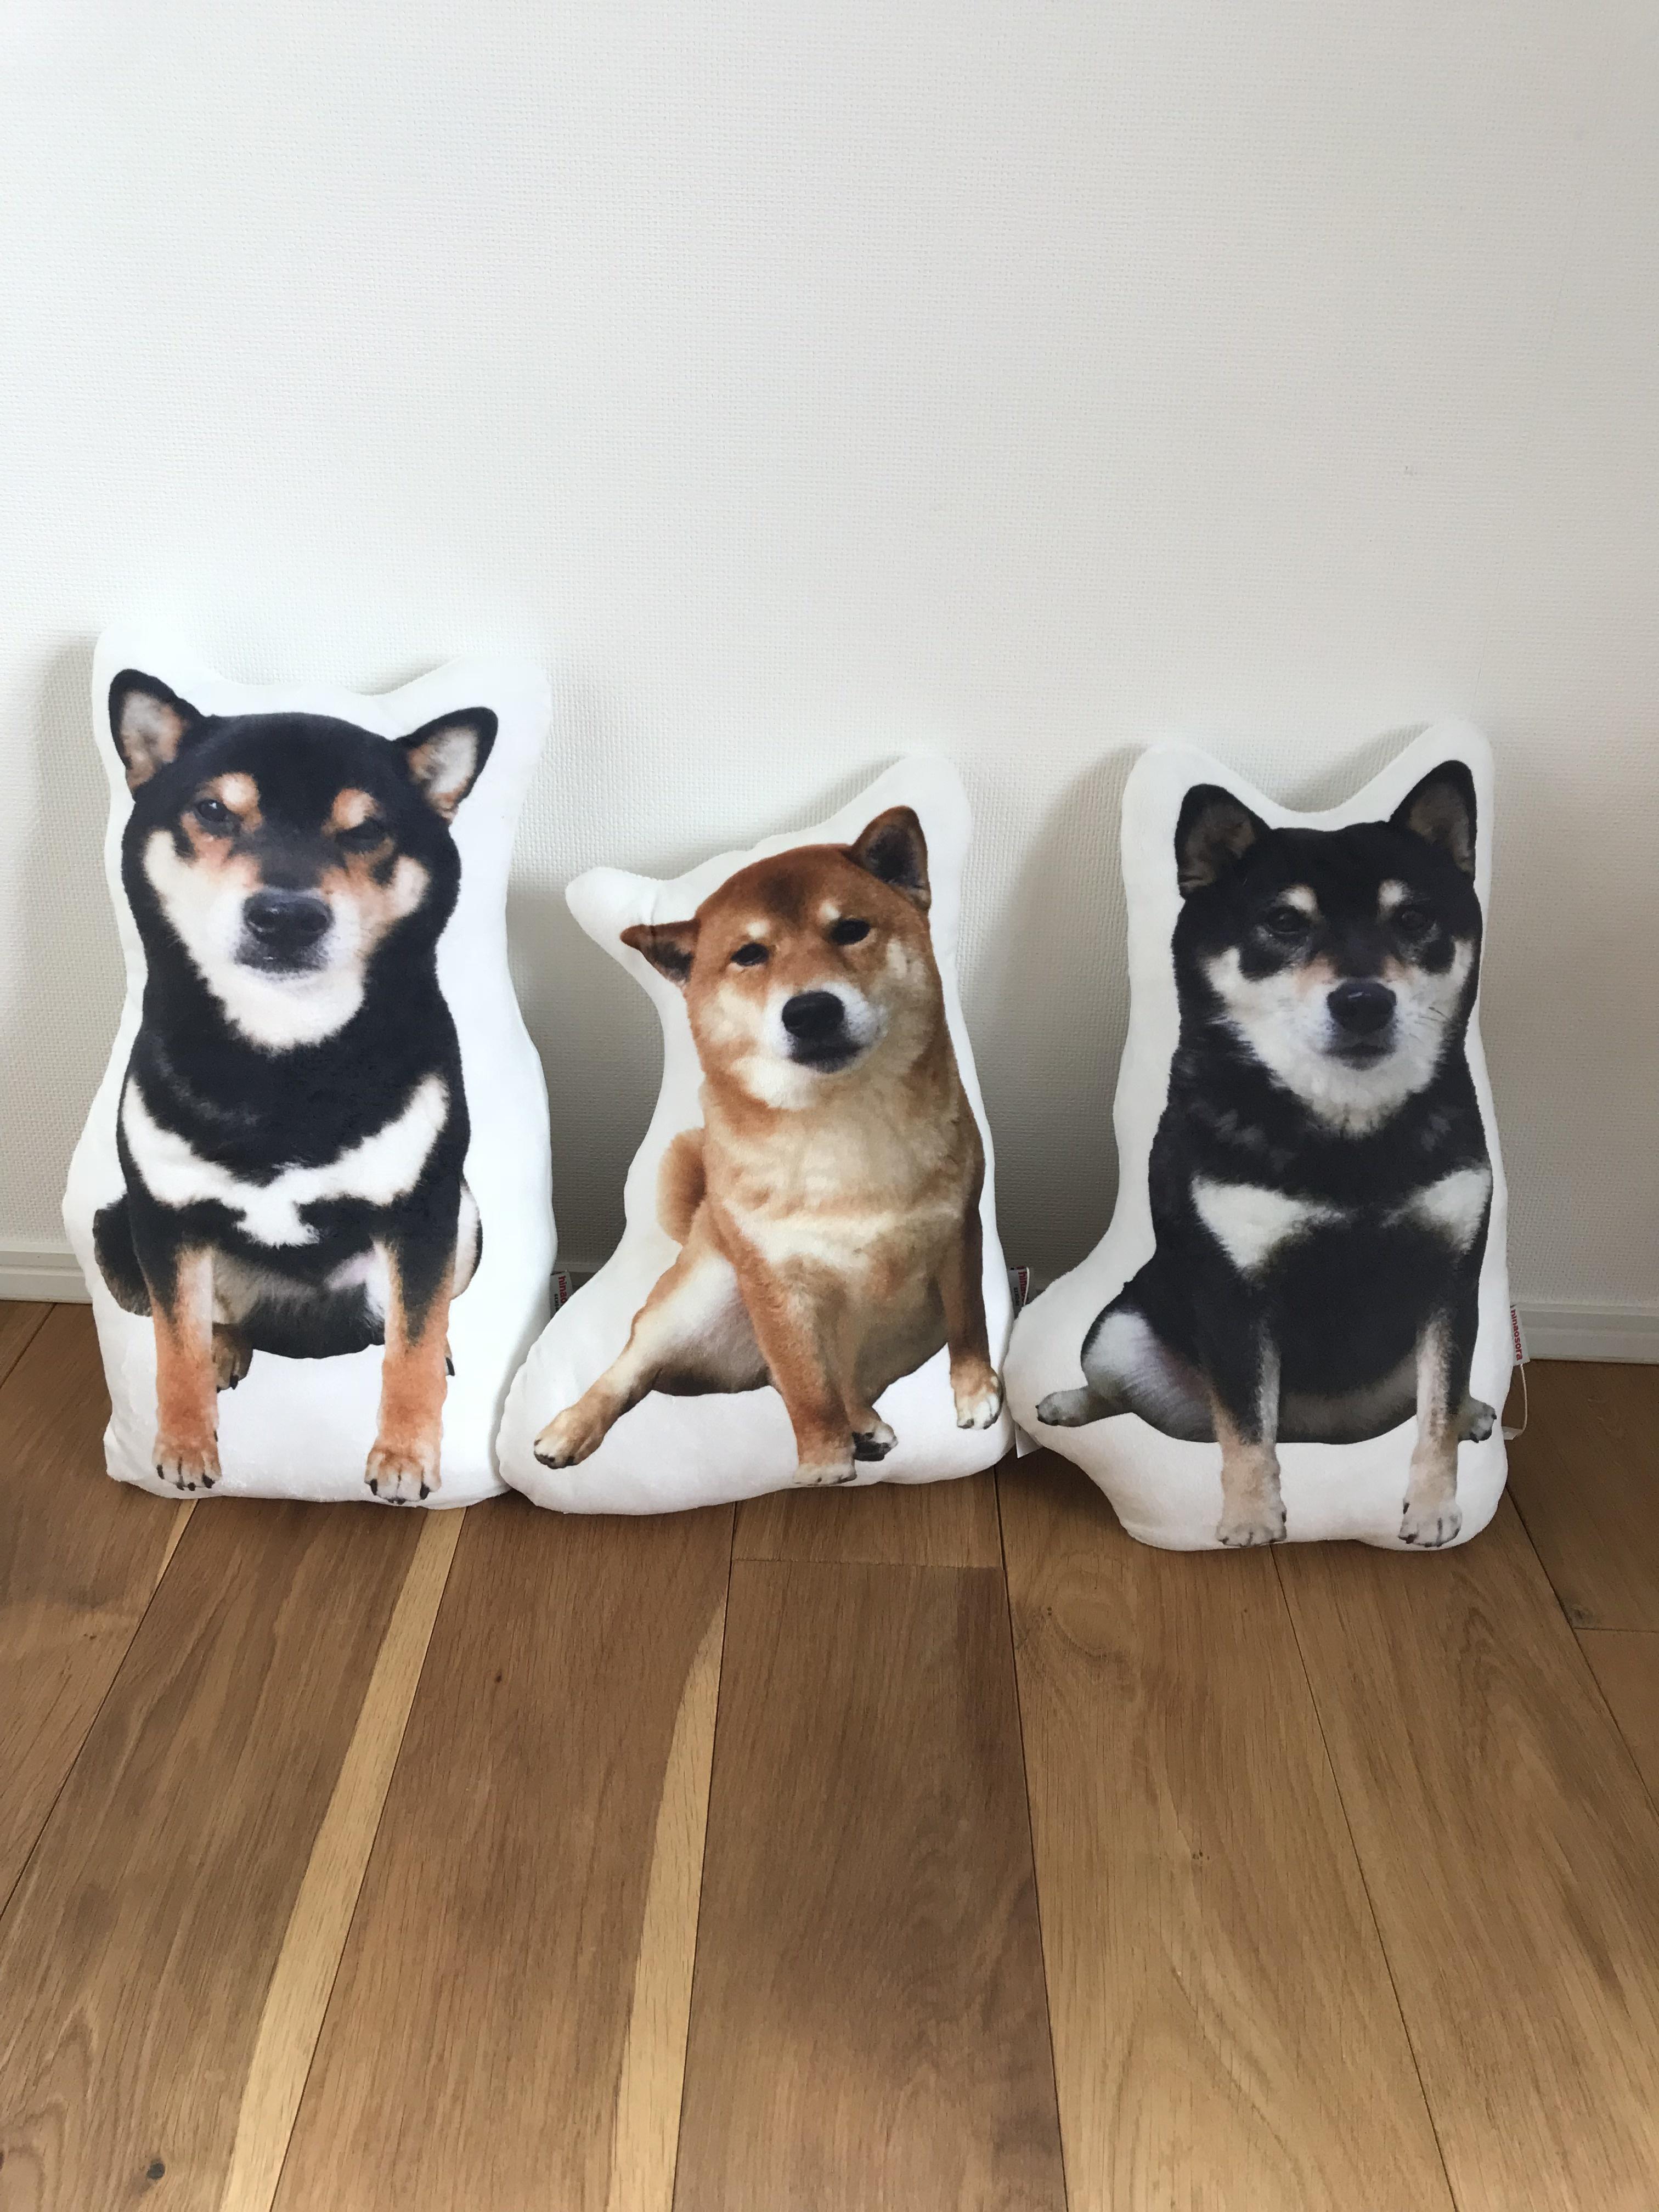 hinaosora  お座り!耳付きクッション 3兄弟セット!